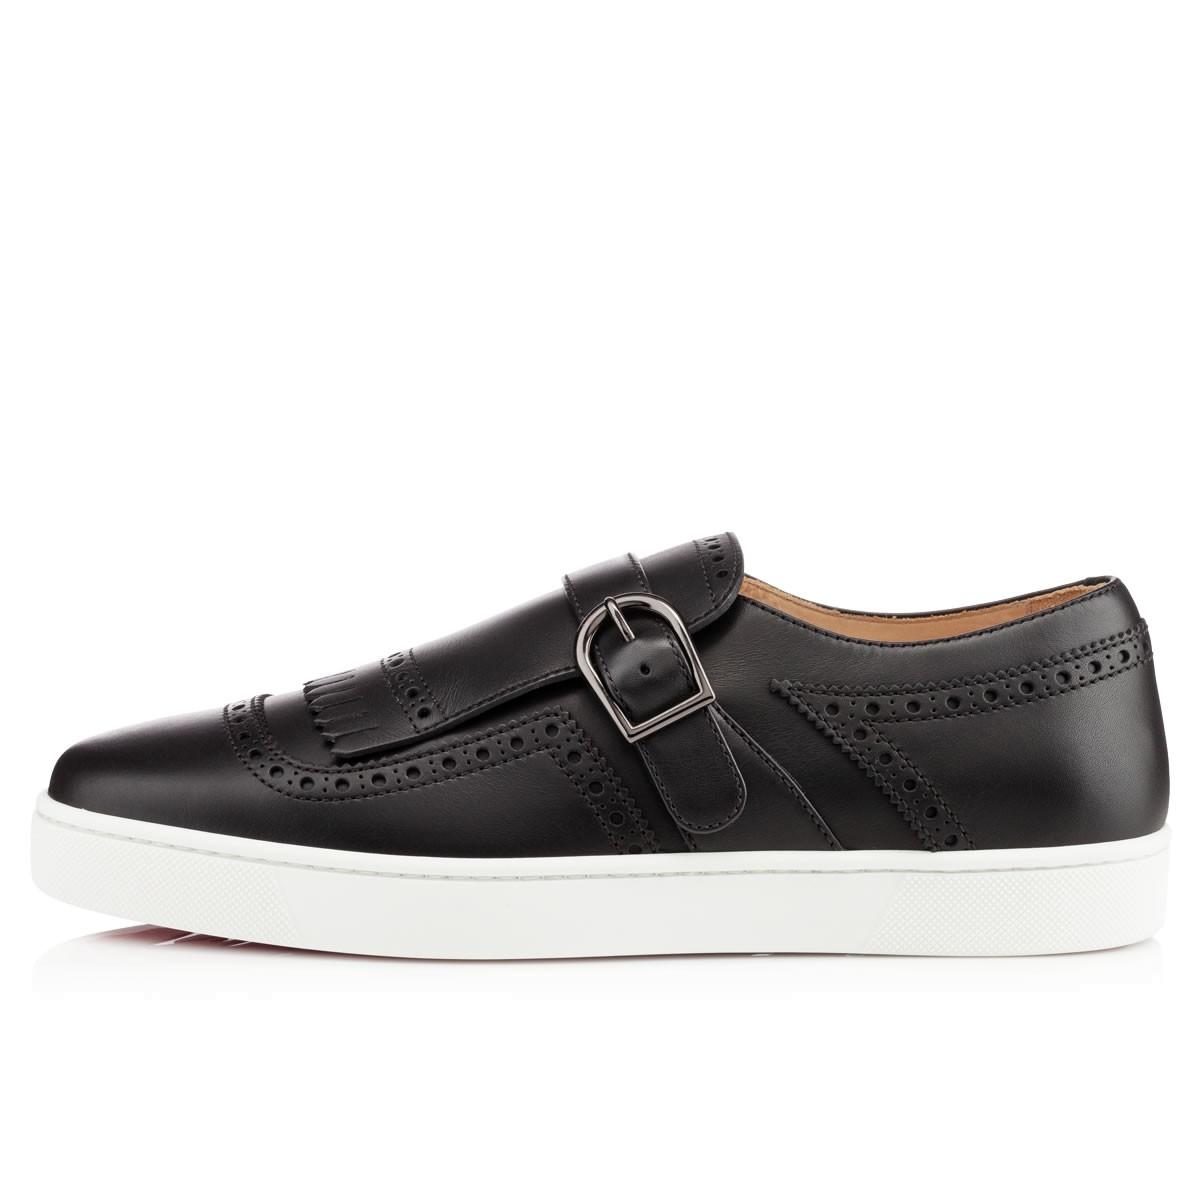 louboutin shoes price - christian louboutin python round-toe high top Louis Junior Flat ...